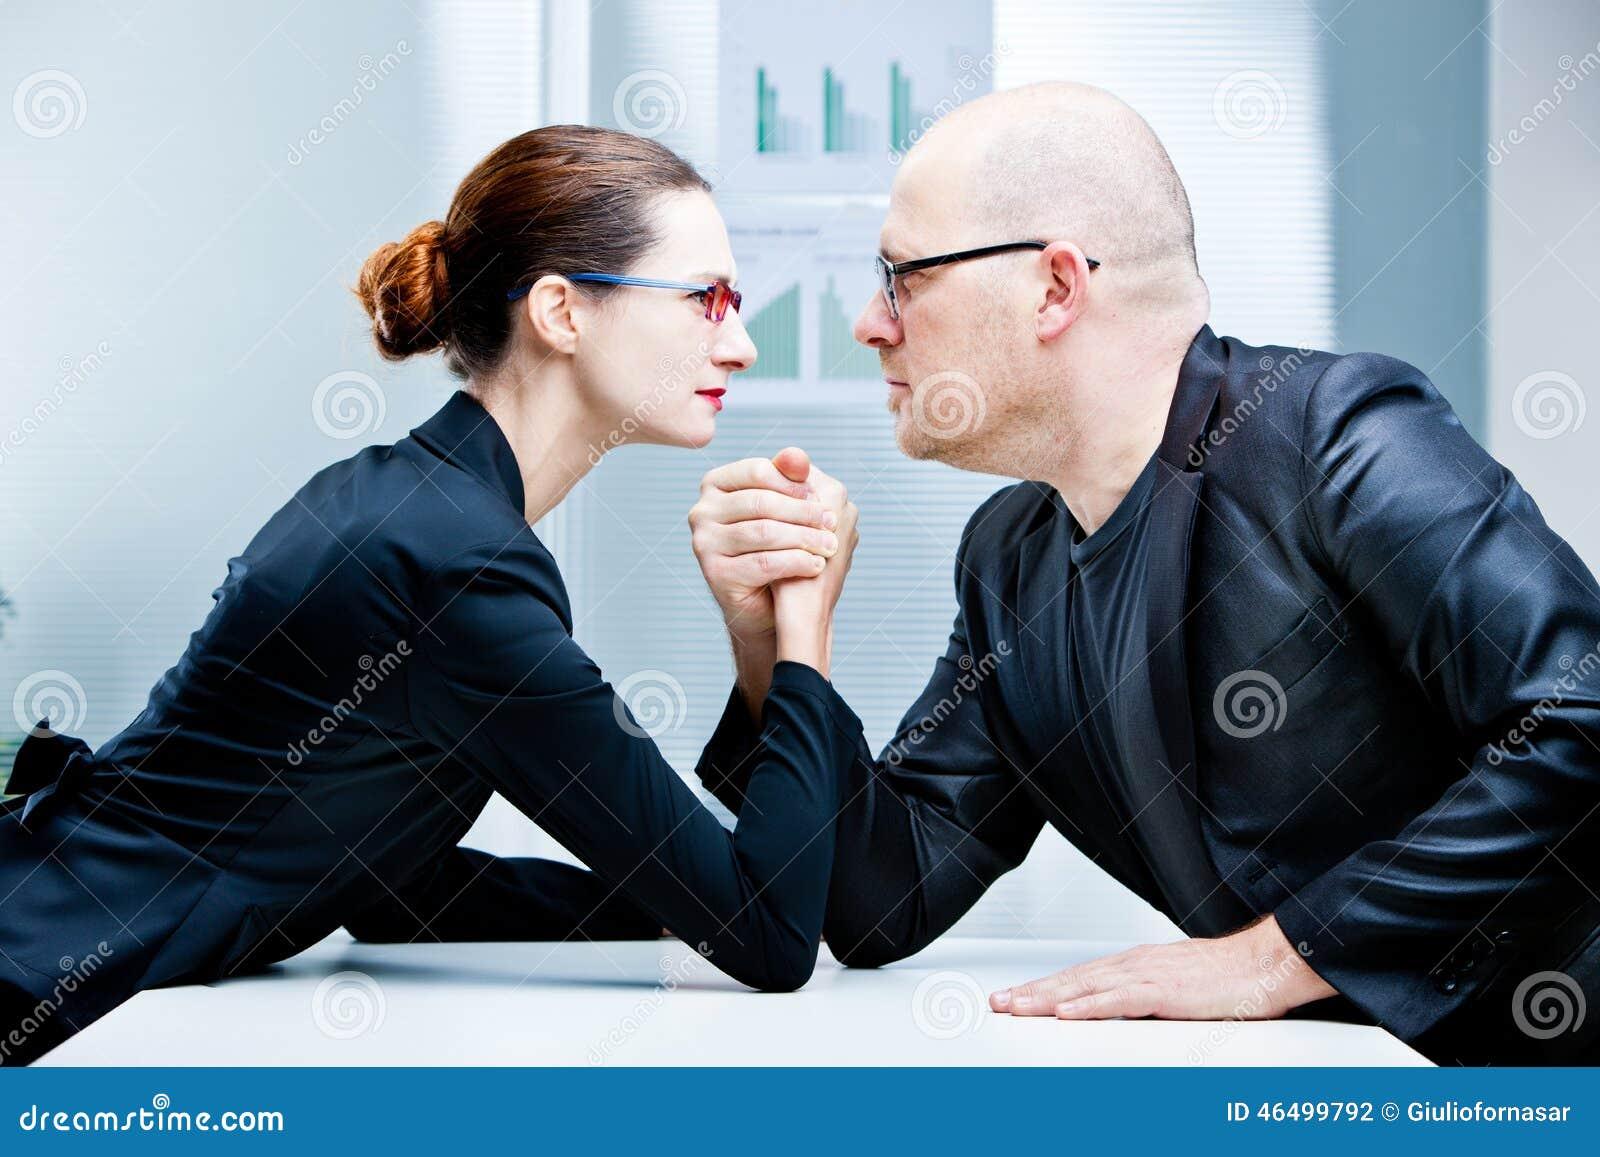 Arm wrestling woman VS man